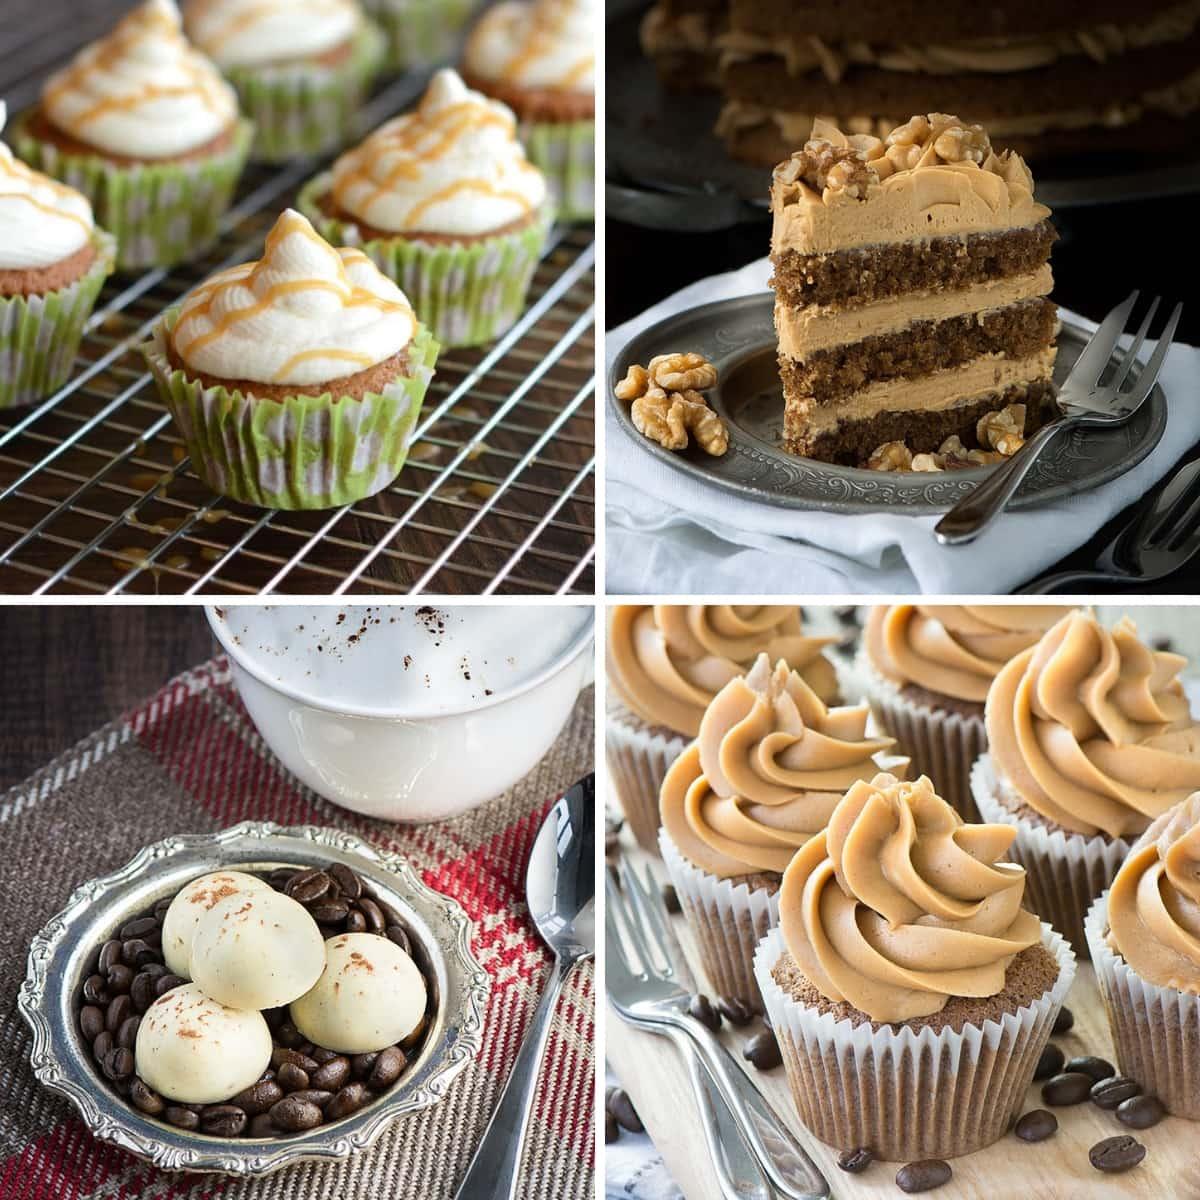 Caramel Macchiato Cupcakes, Coffee & Walnut Cake, Cappuccino Truffles & Coffee Cupcakes